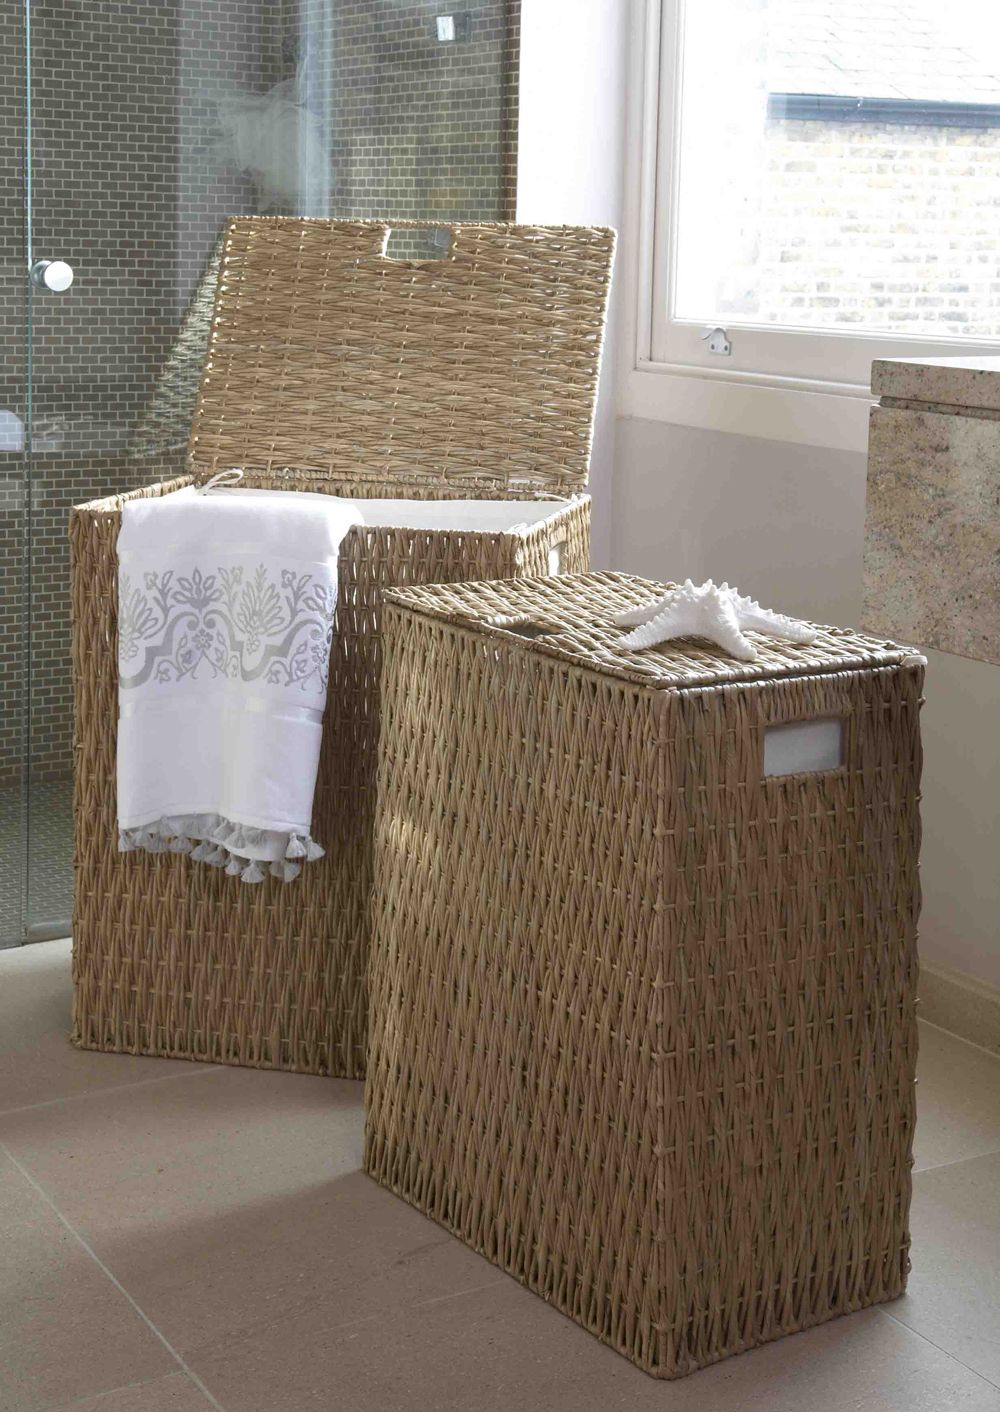 Pf Lau091 Jpg 1 000 1 412 Pixels Laundry Room Baskets Laundry